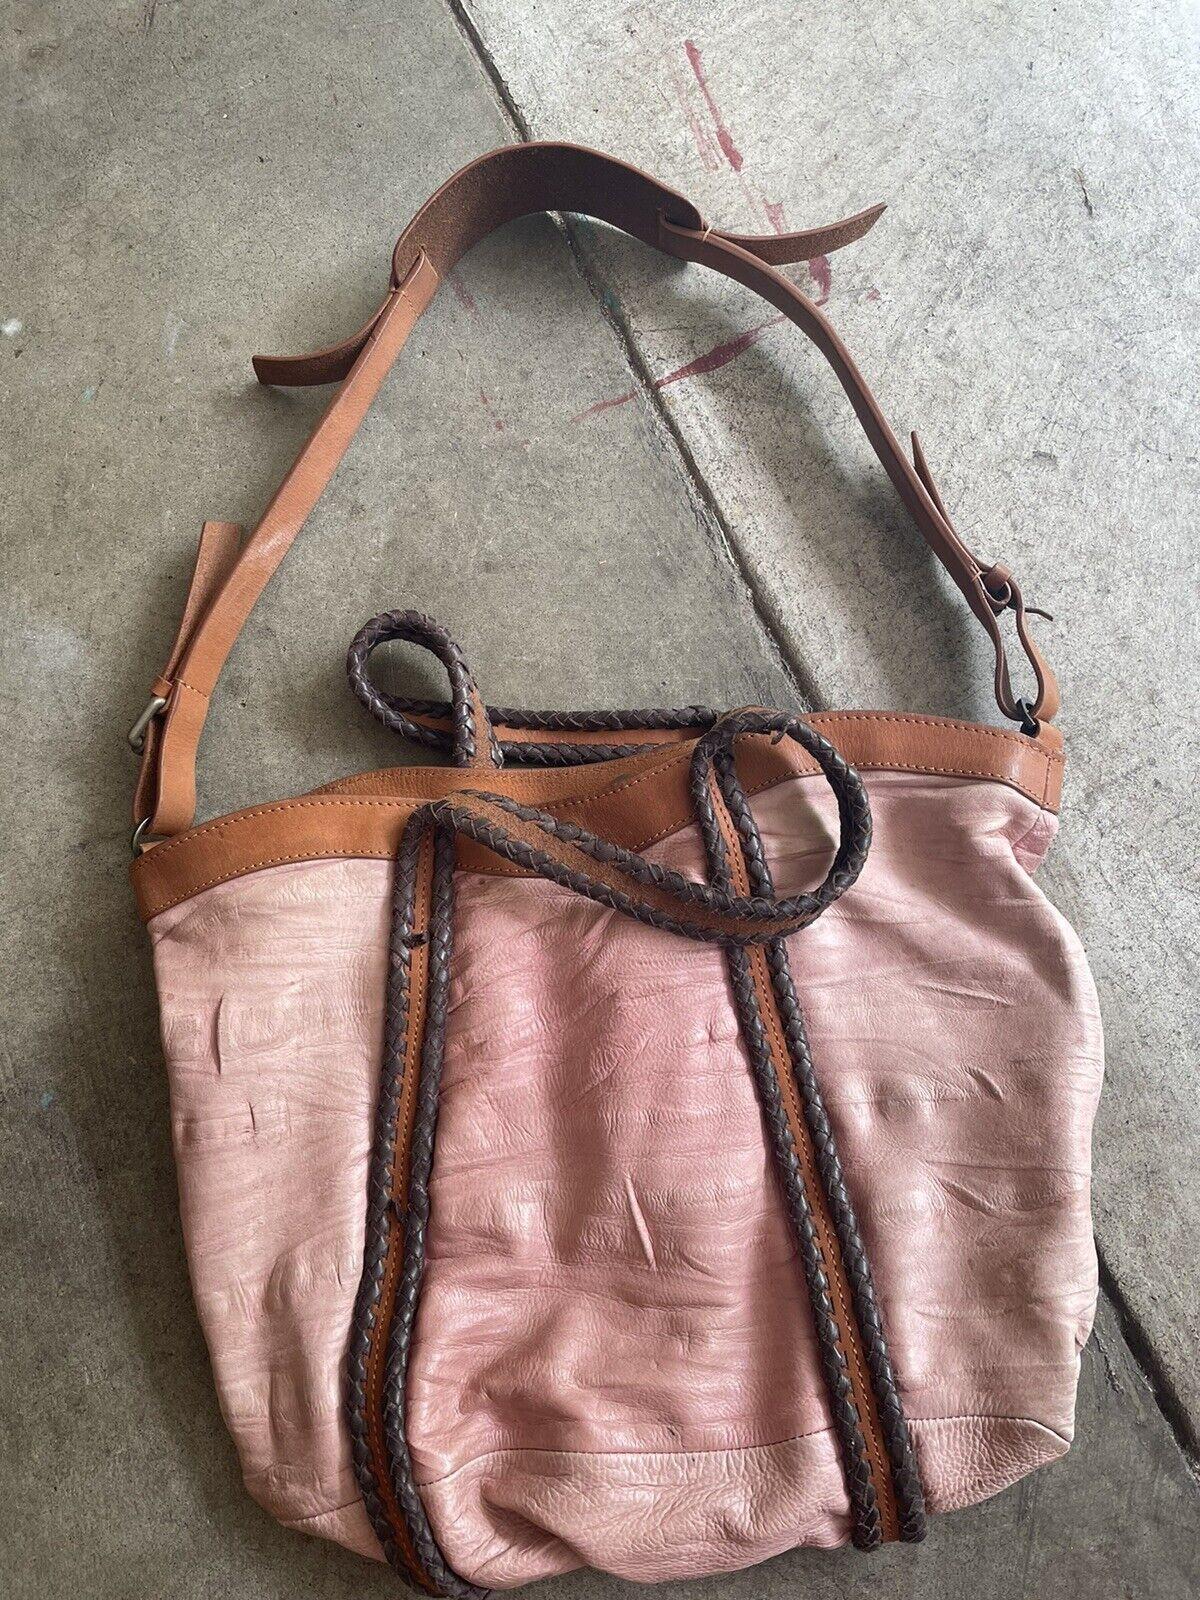 holding horses Leather Dusty Pink bag - image 3